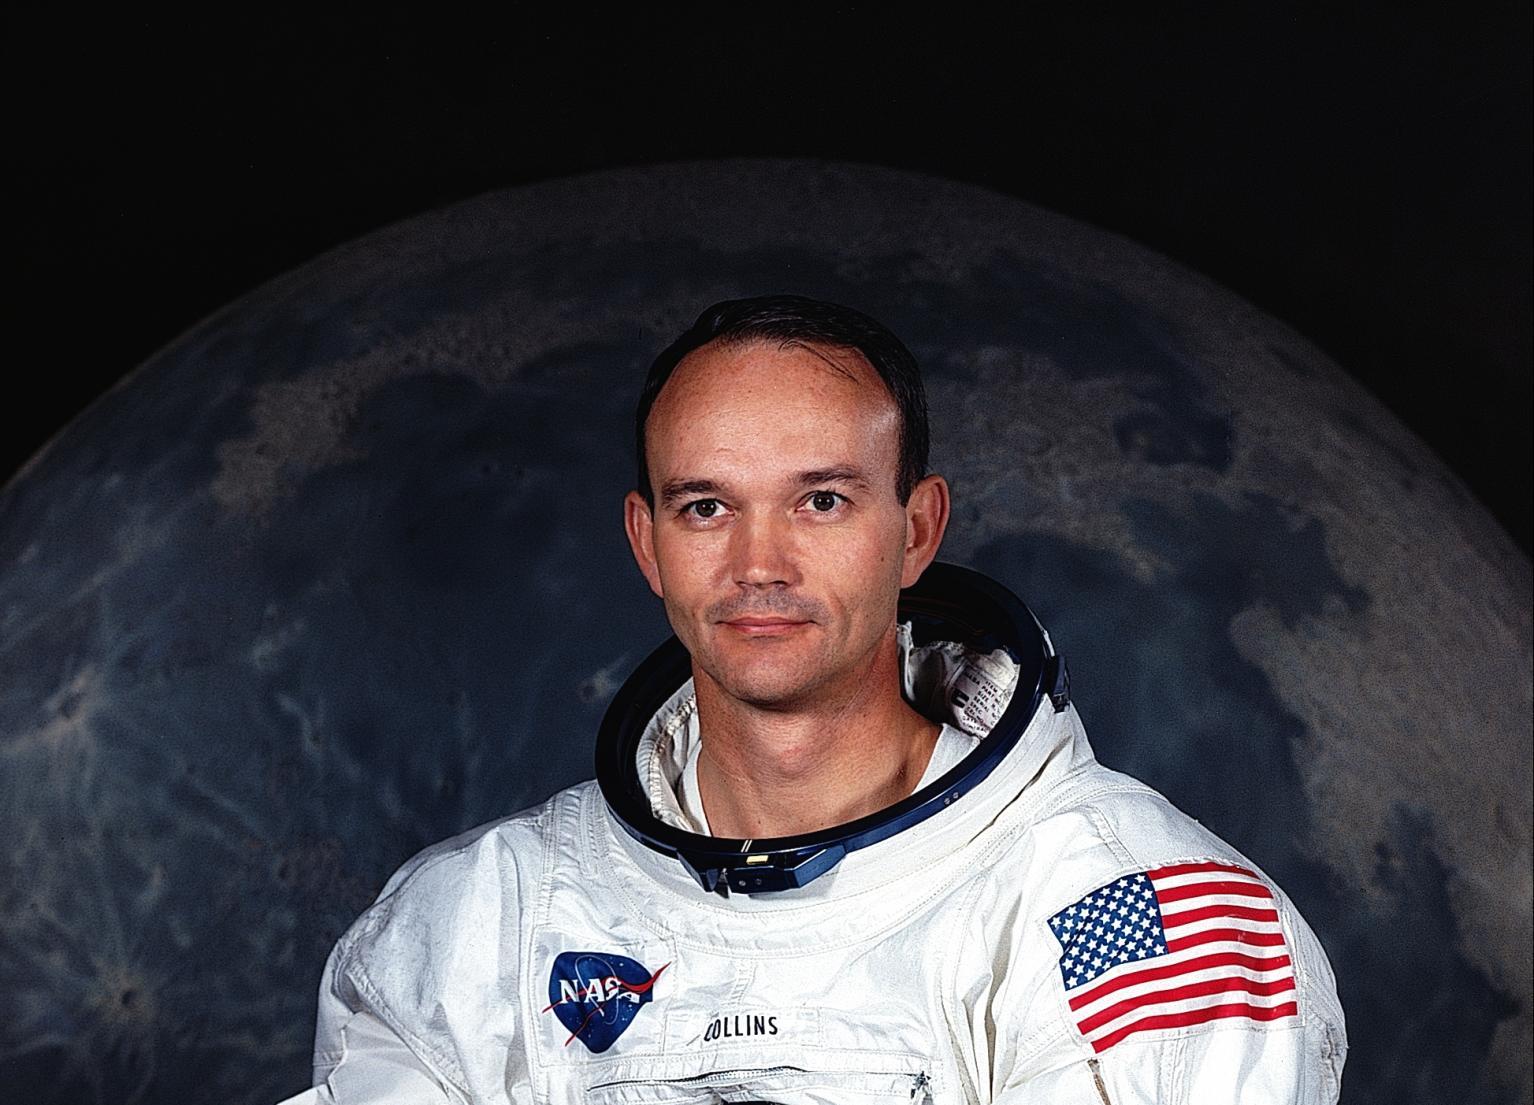 Michael Collins   Hack the Moon